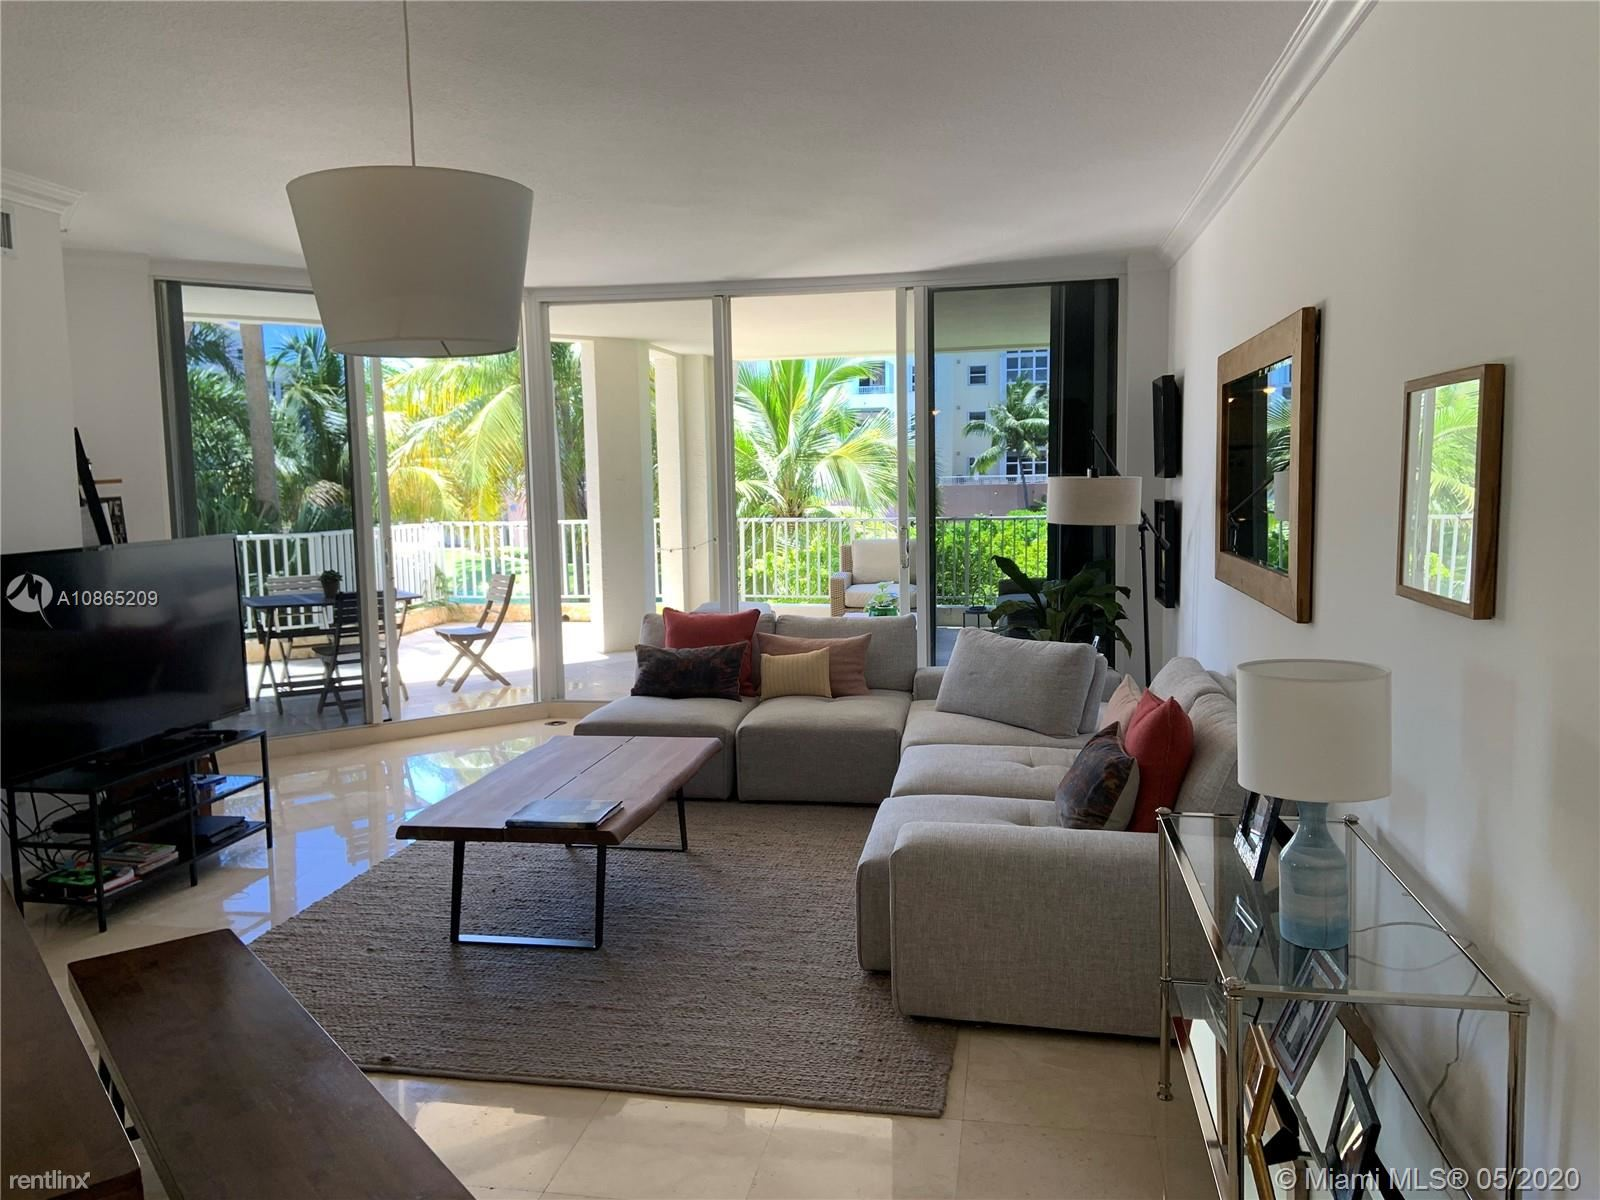 705 Crandon Blvd Apt 206, Key Biscayne, FL - $5,000